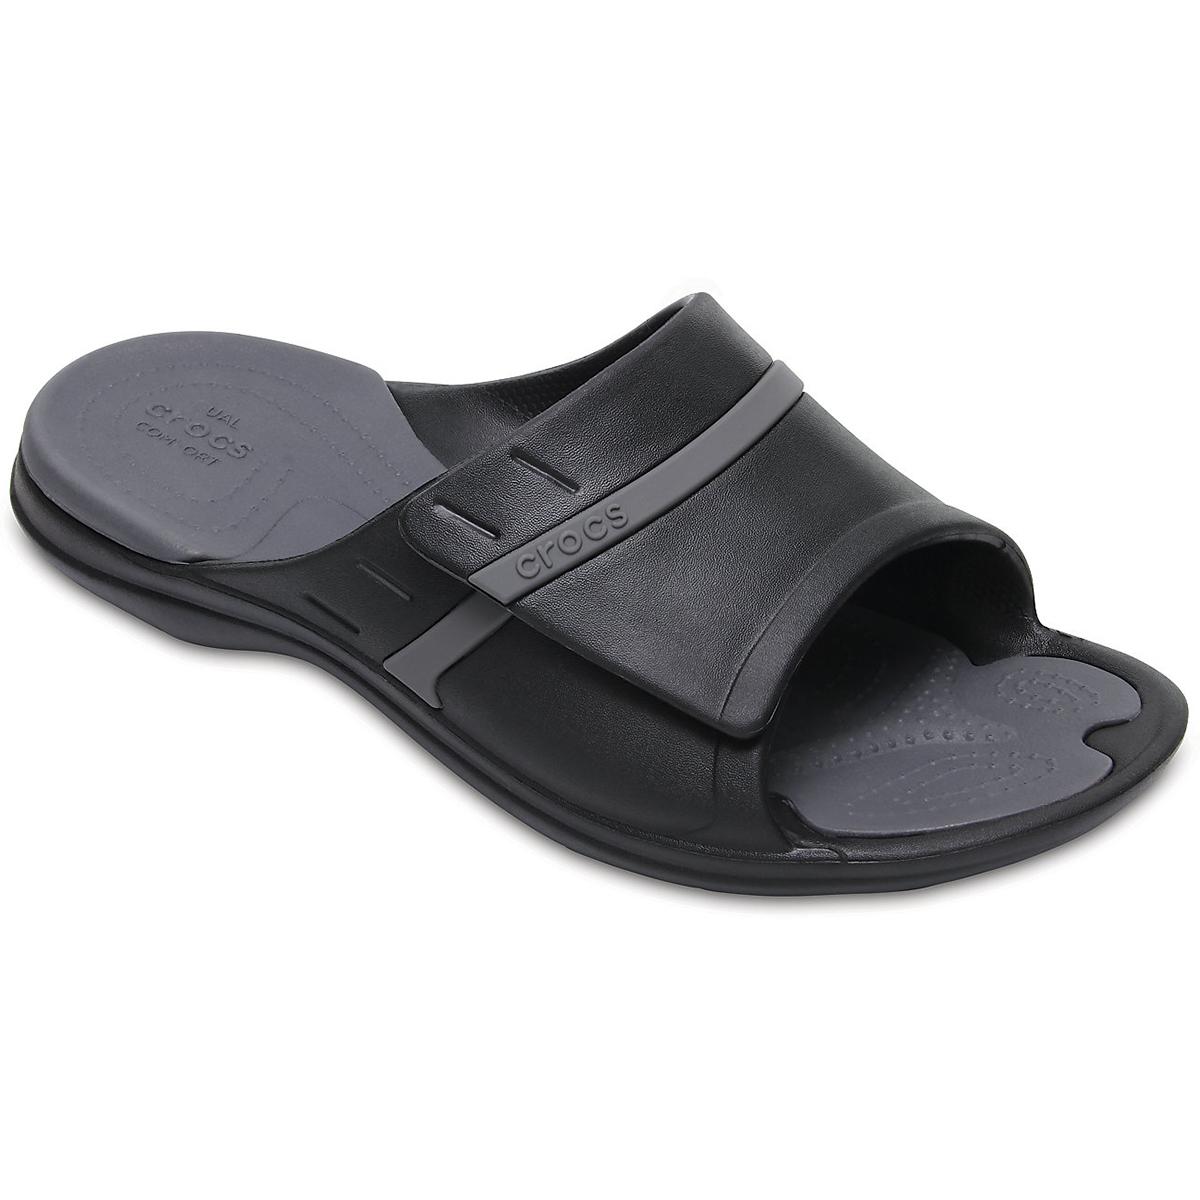 Crocs Unisex Modi Sport Slides - Black, 10